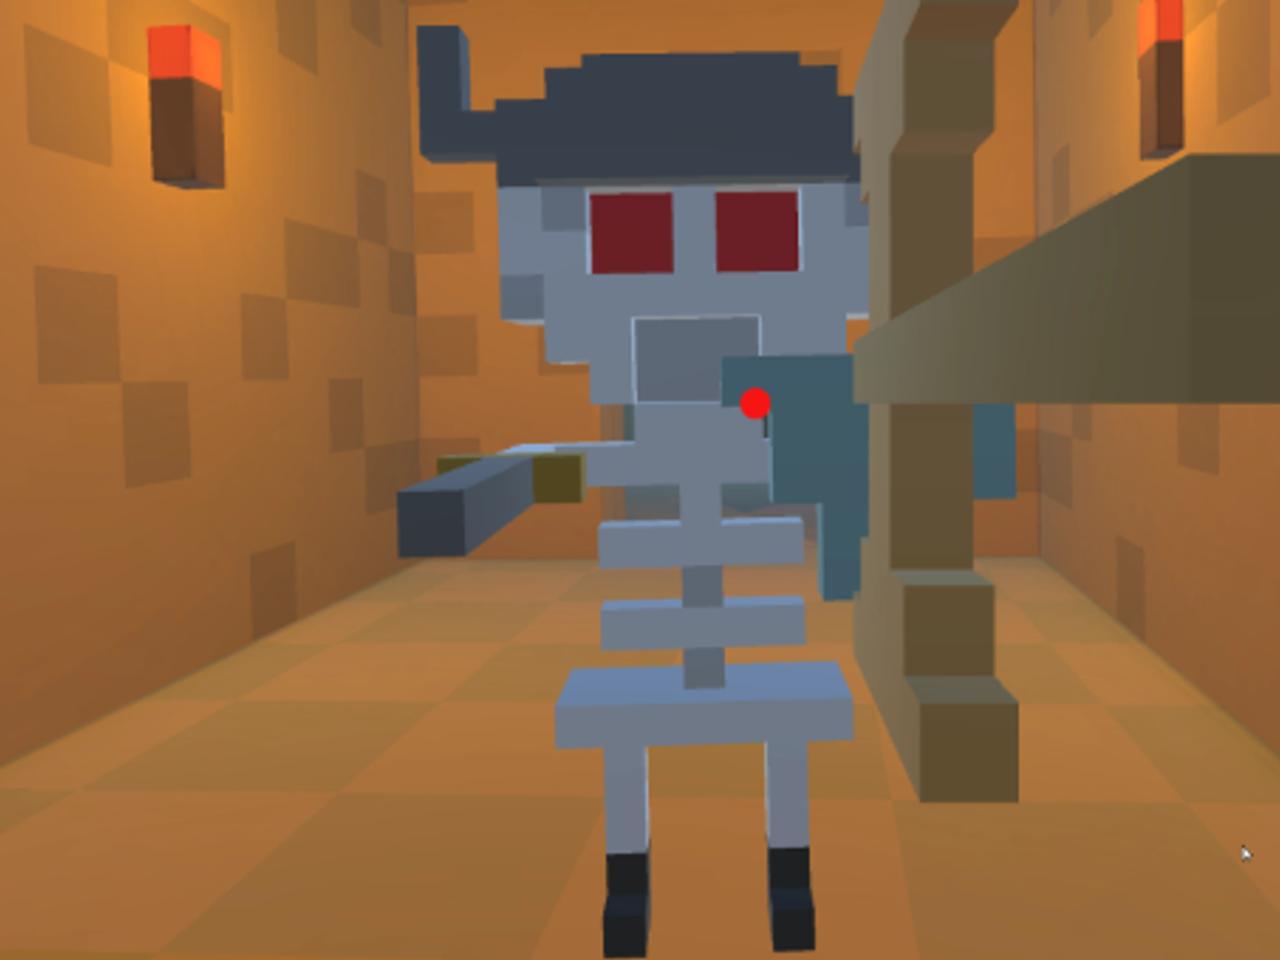 Combat RPG Game in VR